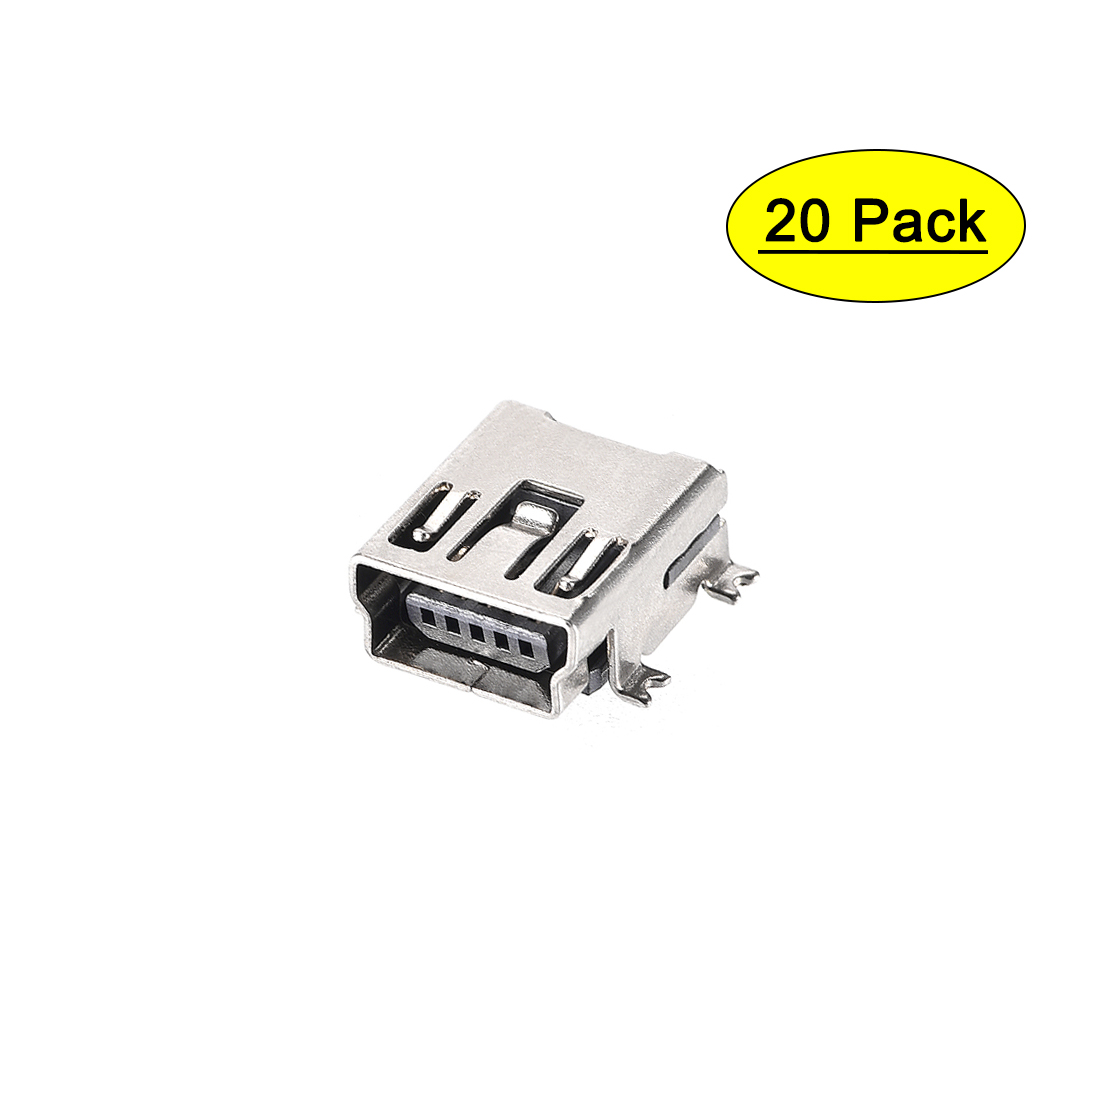 Color: 100PCS Gimax 10-500pcs 180 Degree white Dual micro mini USB 2.0 Data Connector Jack socket USB Female Plug for DIY Accessories Computer PC